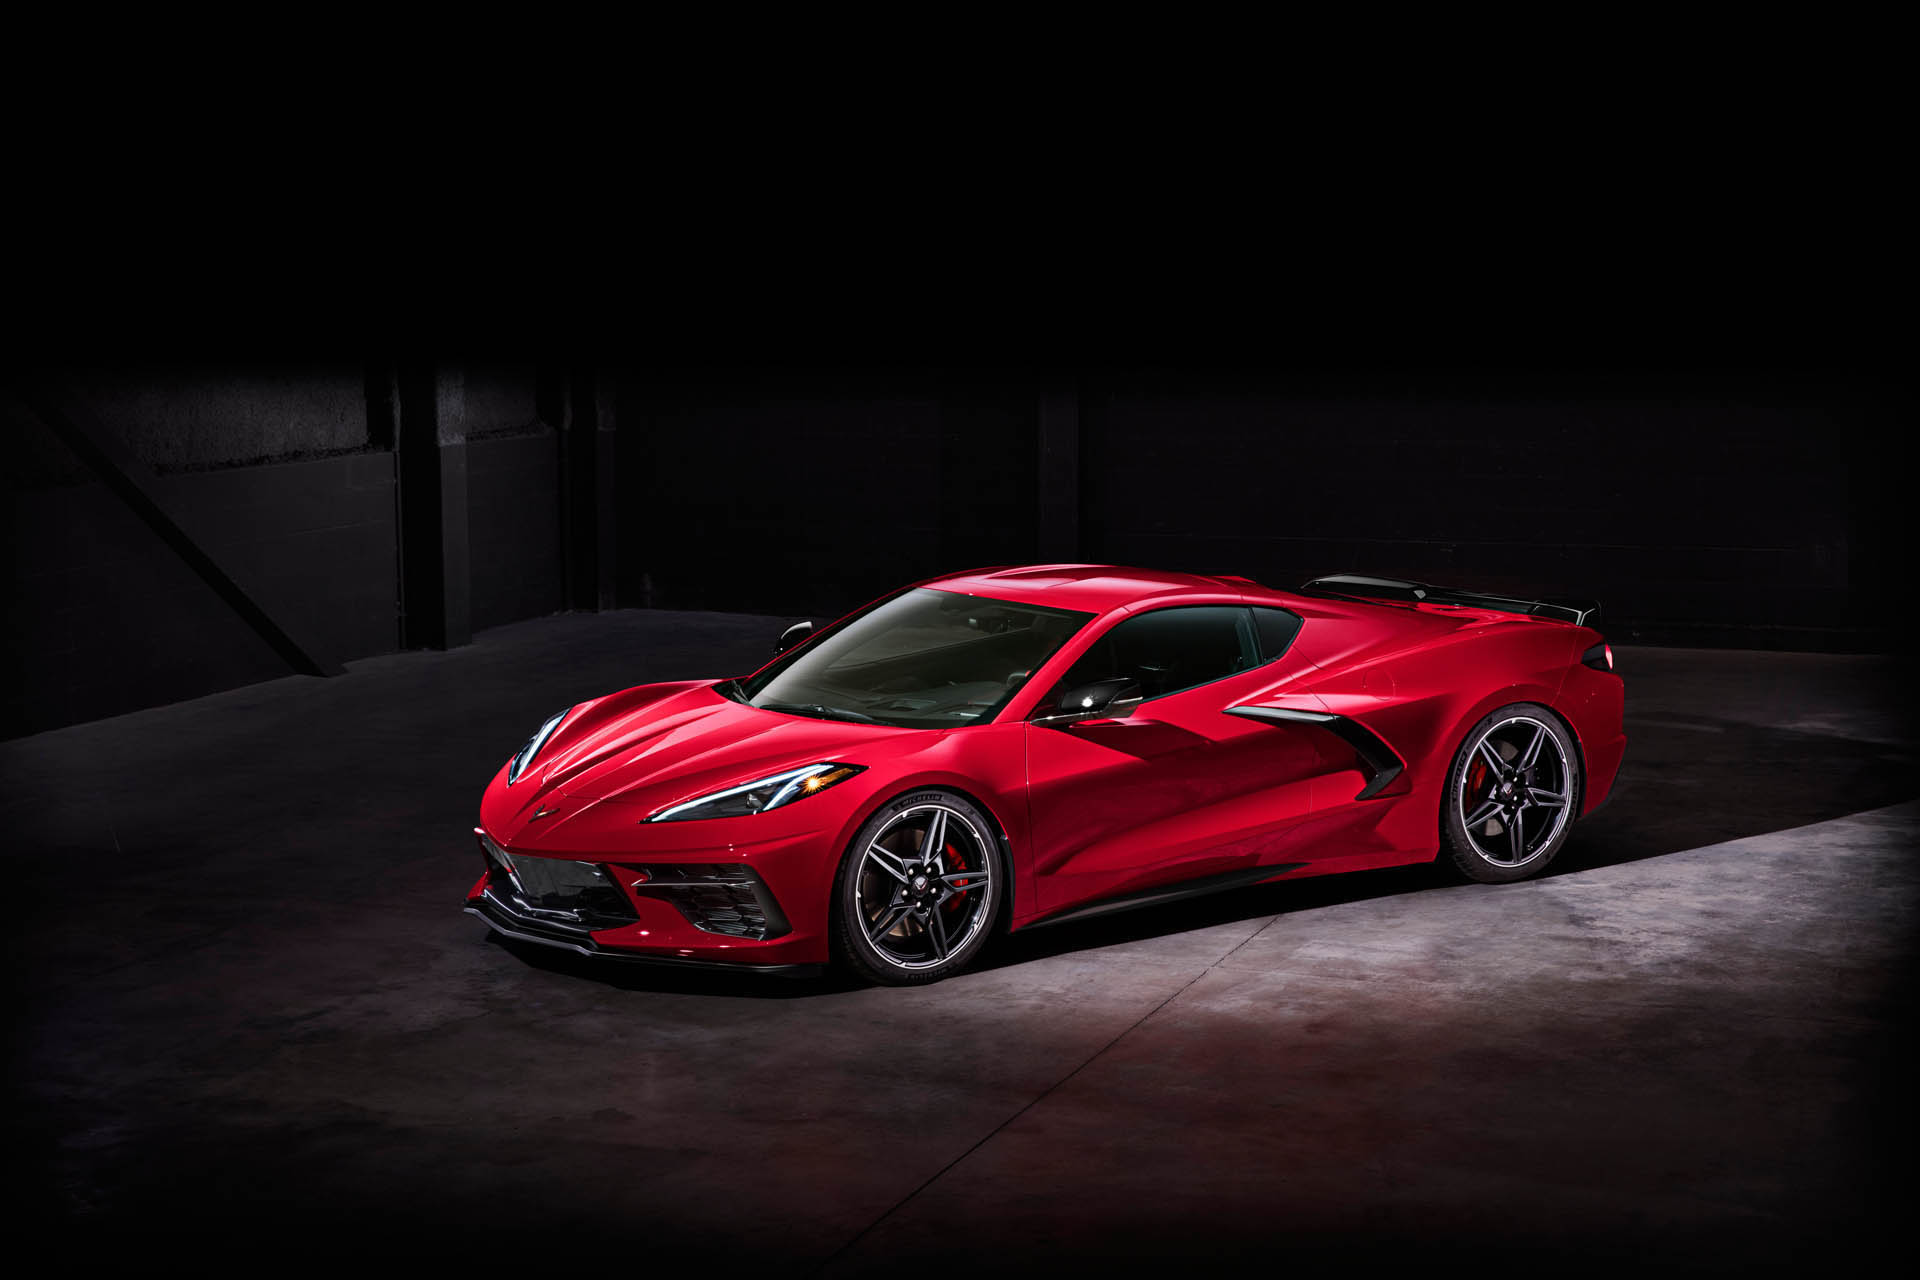 Corvette Stingray 2020